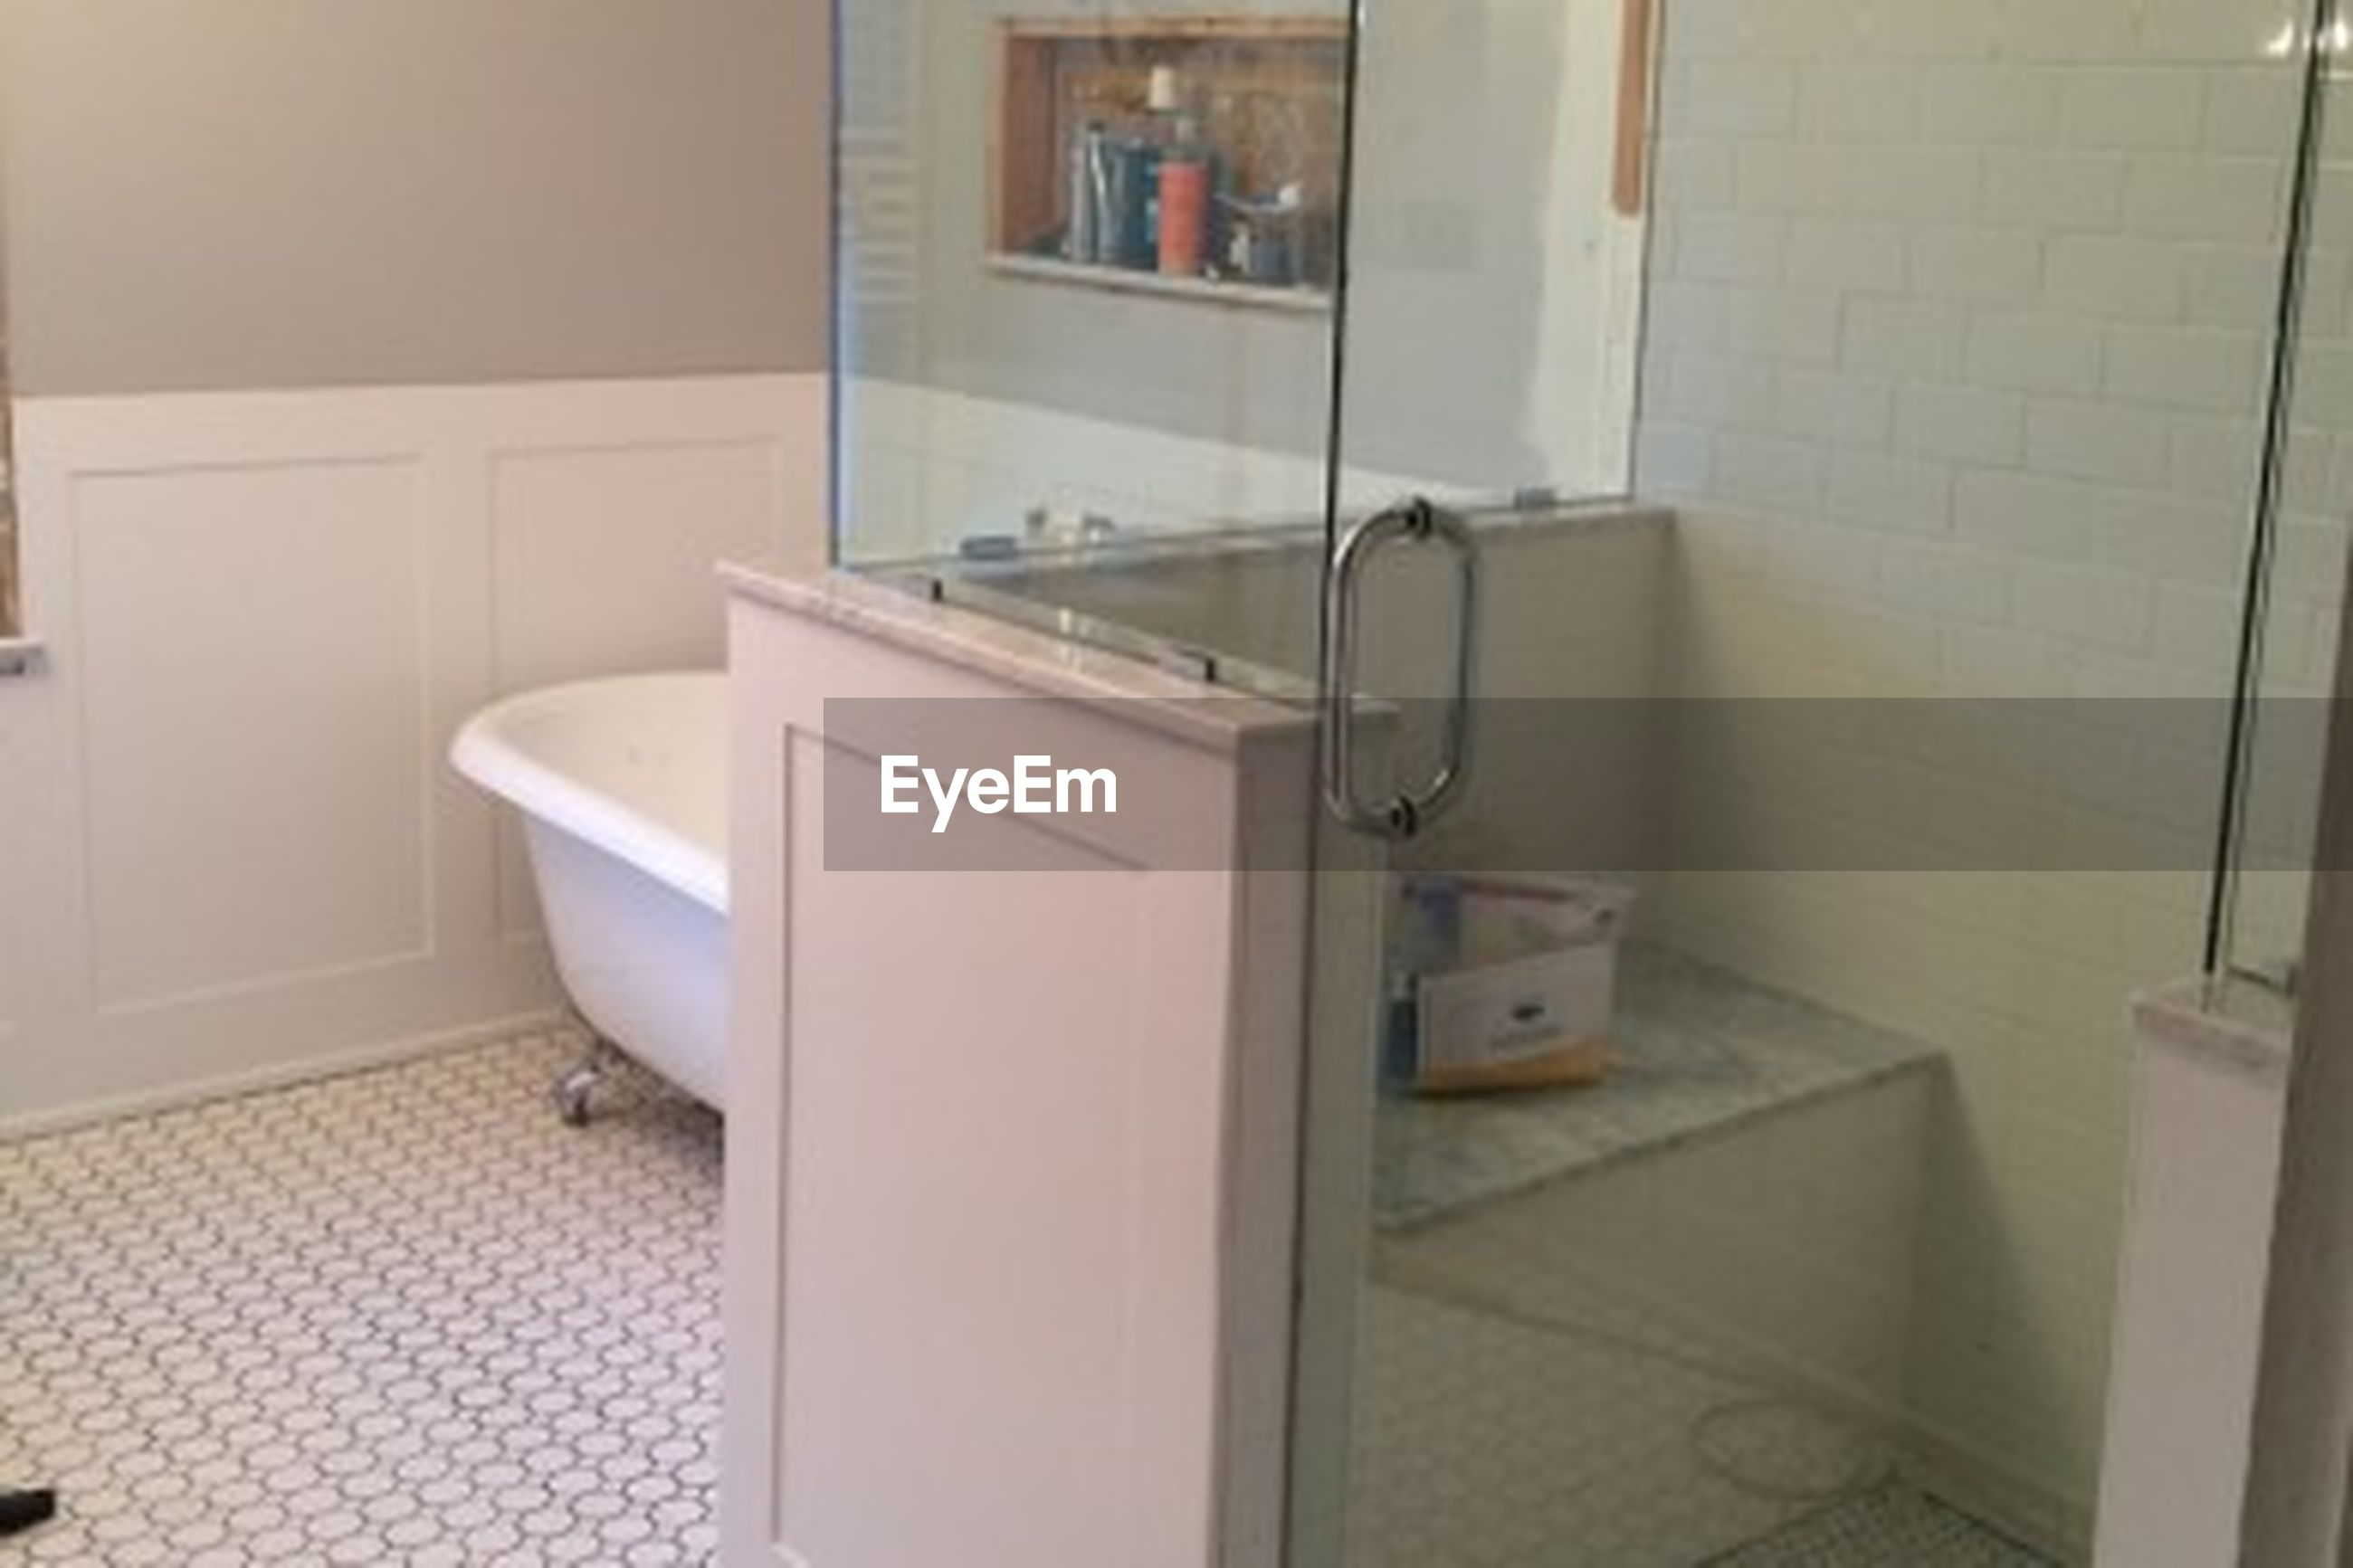 domestic room, domestic bathroom, bathroom, faucet, modern, tiled floor, luxury, home interior, no people, indoors, bathroom sink, day